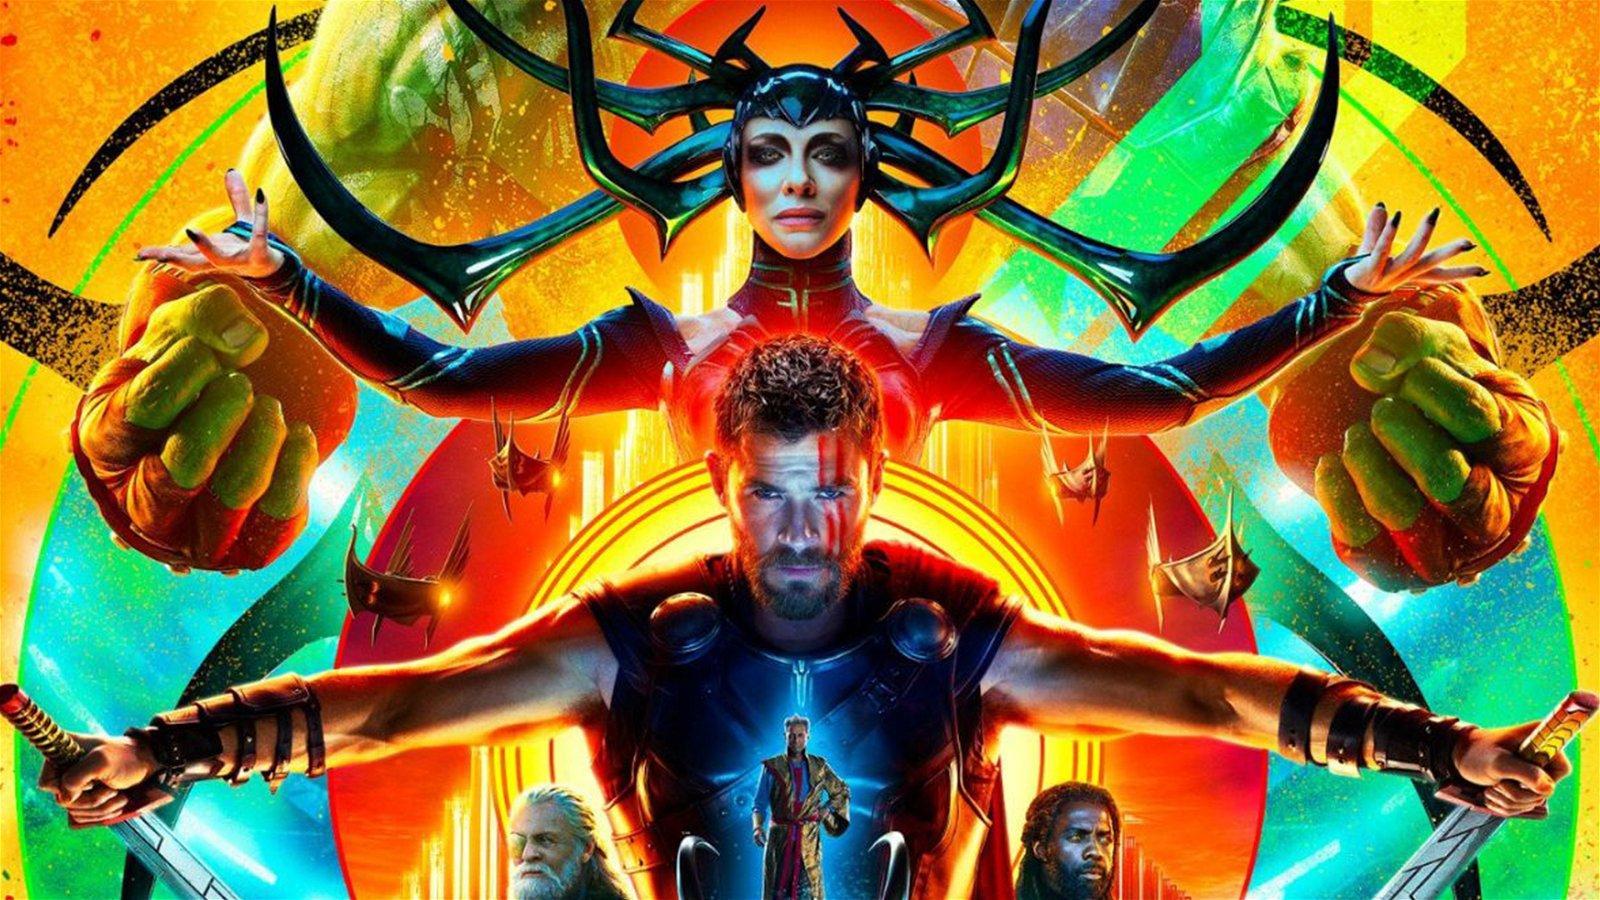 Thor: Ragnarok Could Be Director Taika Waititi at His Best 2